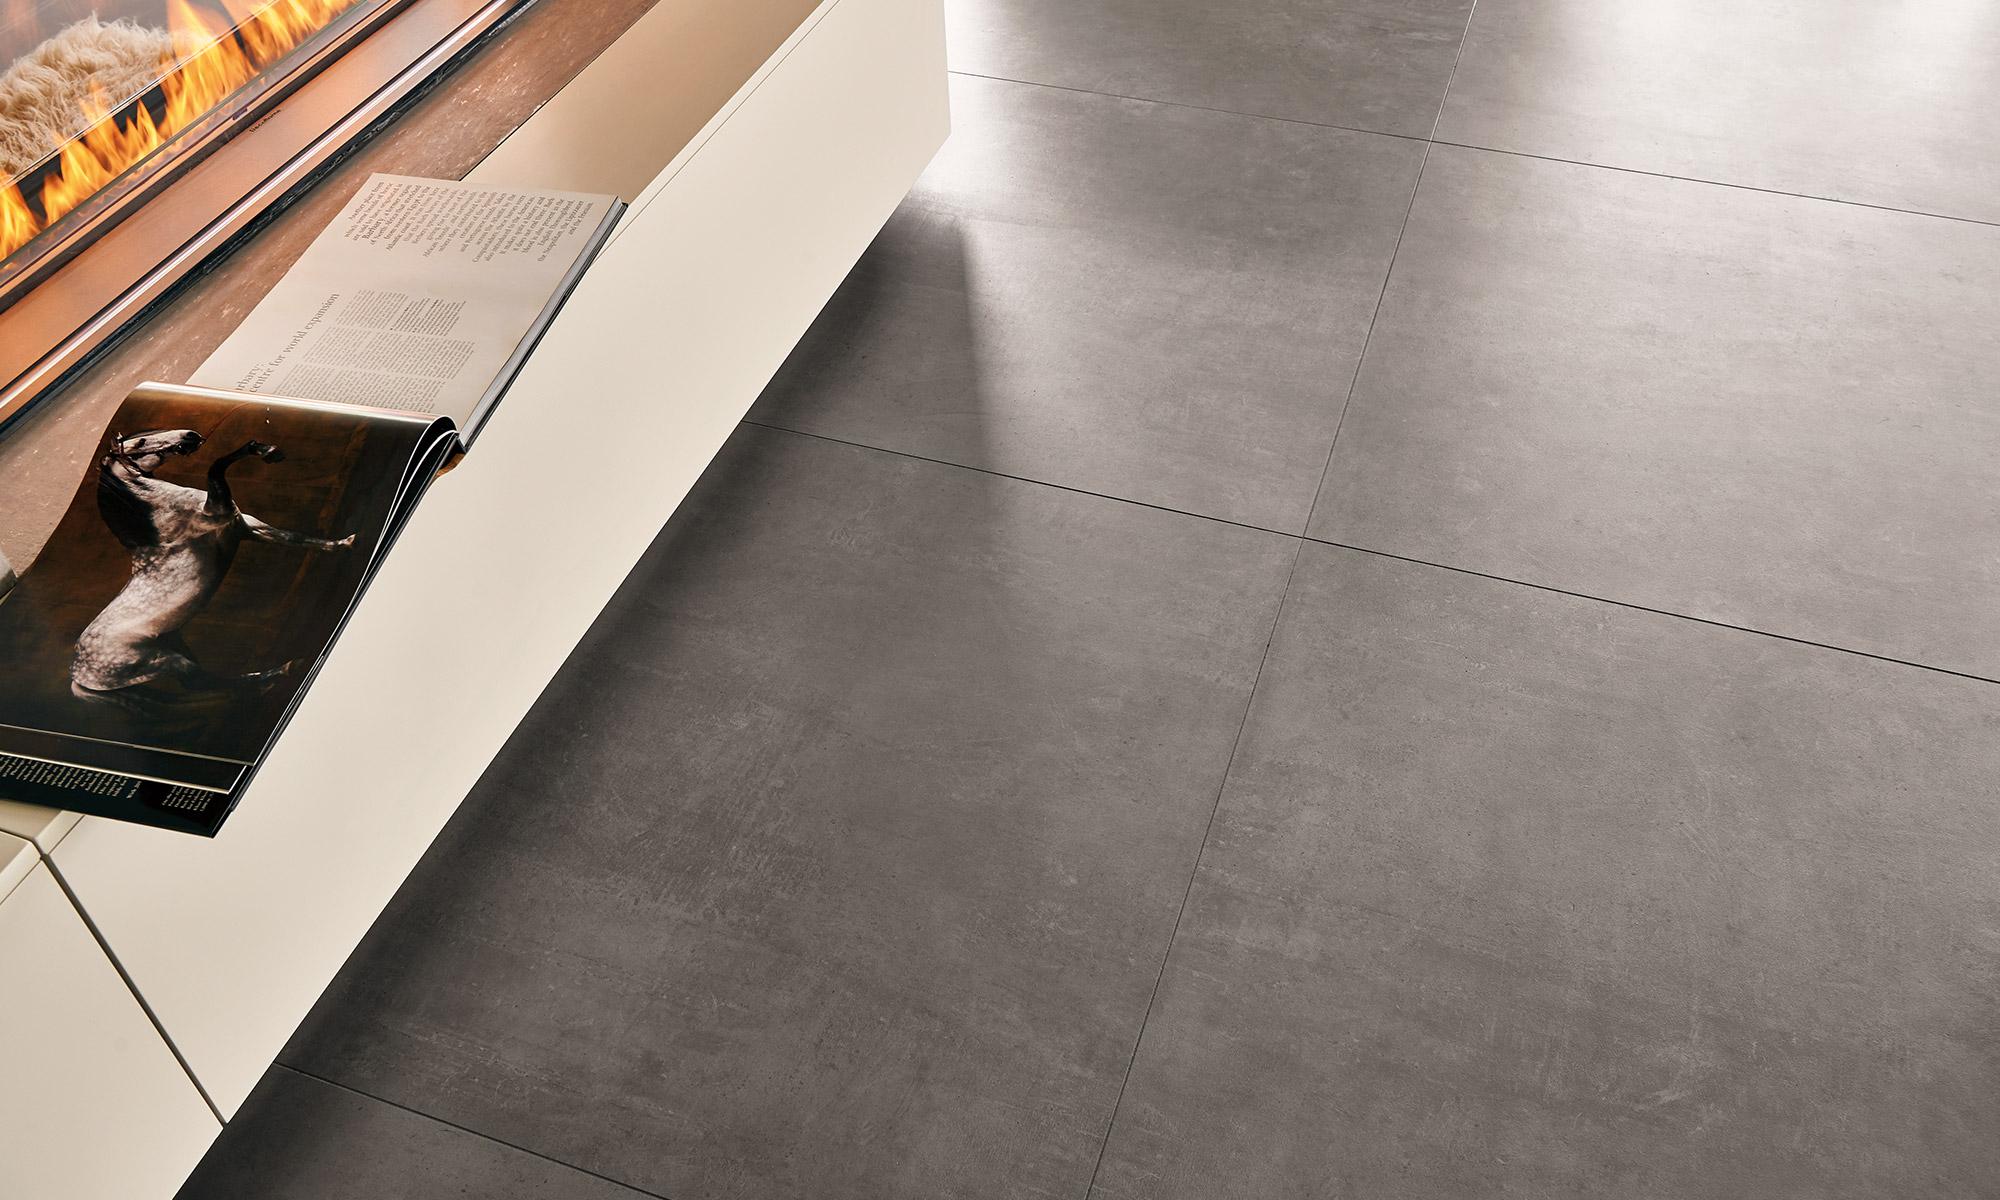 porcelain tile images: Urbe range high quality photo